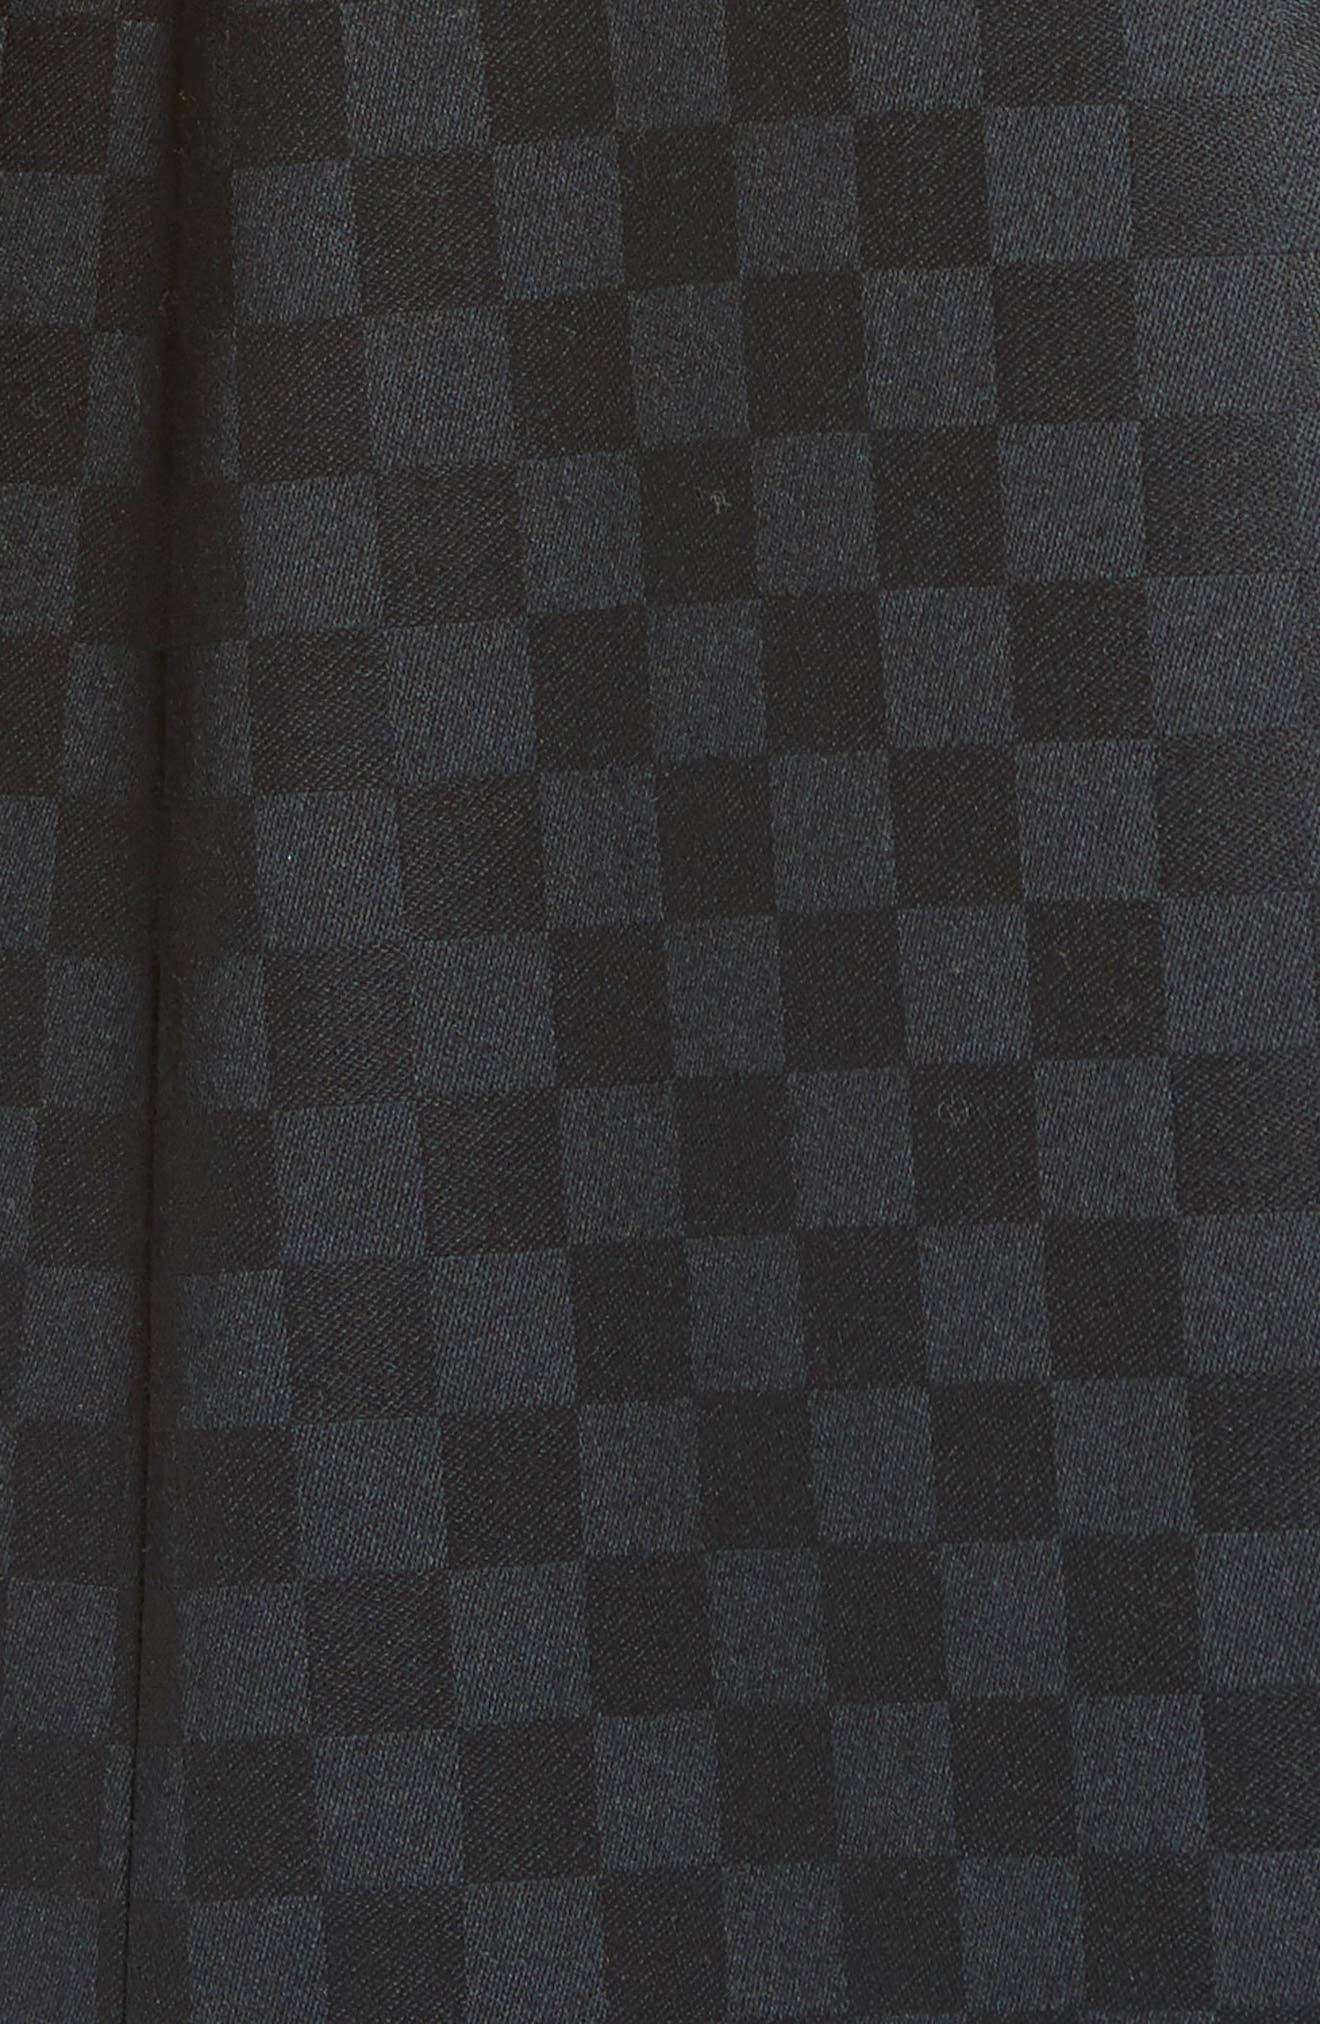 Chain Trim Checkerboard Wool Blazer,                             Alternate thumbnail 6, color,                             001